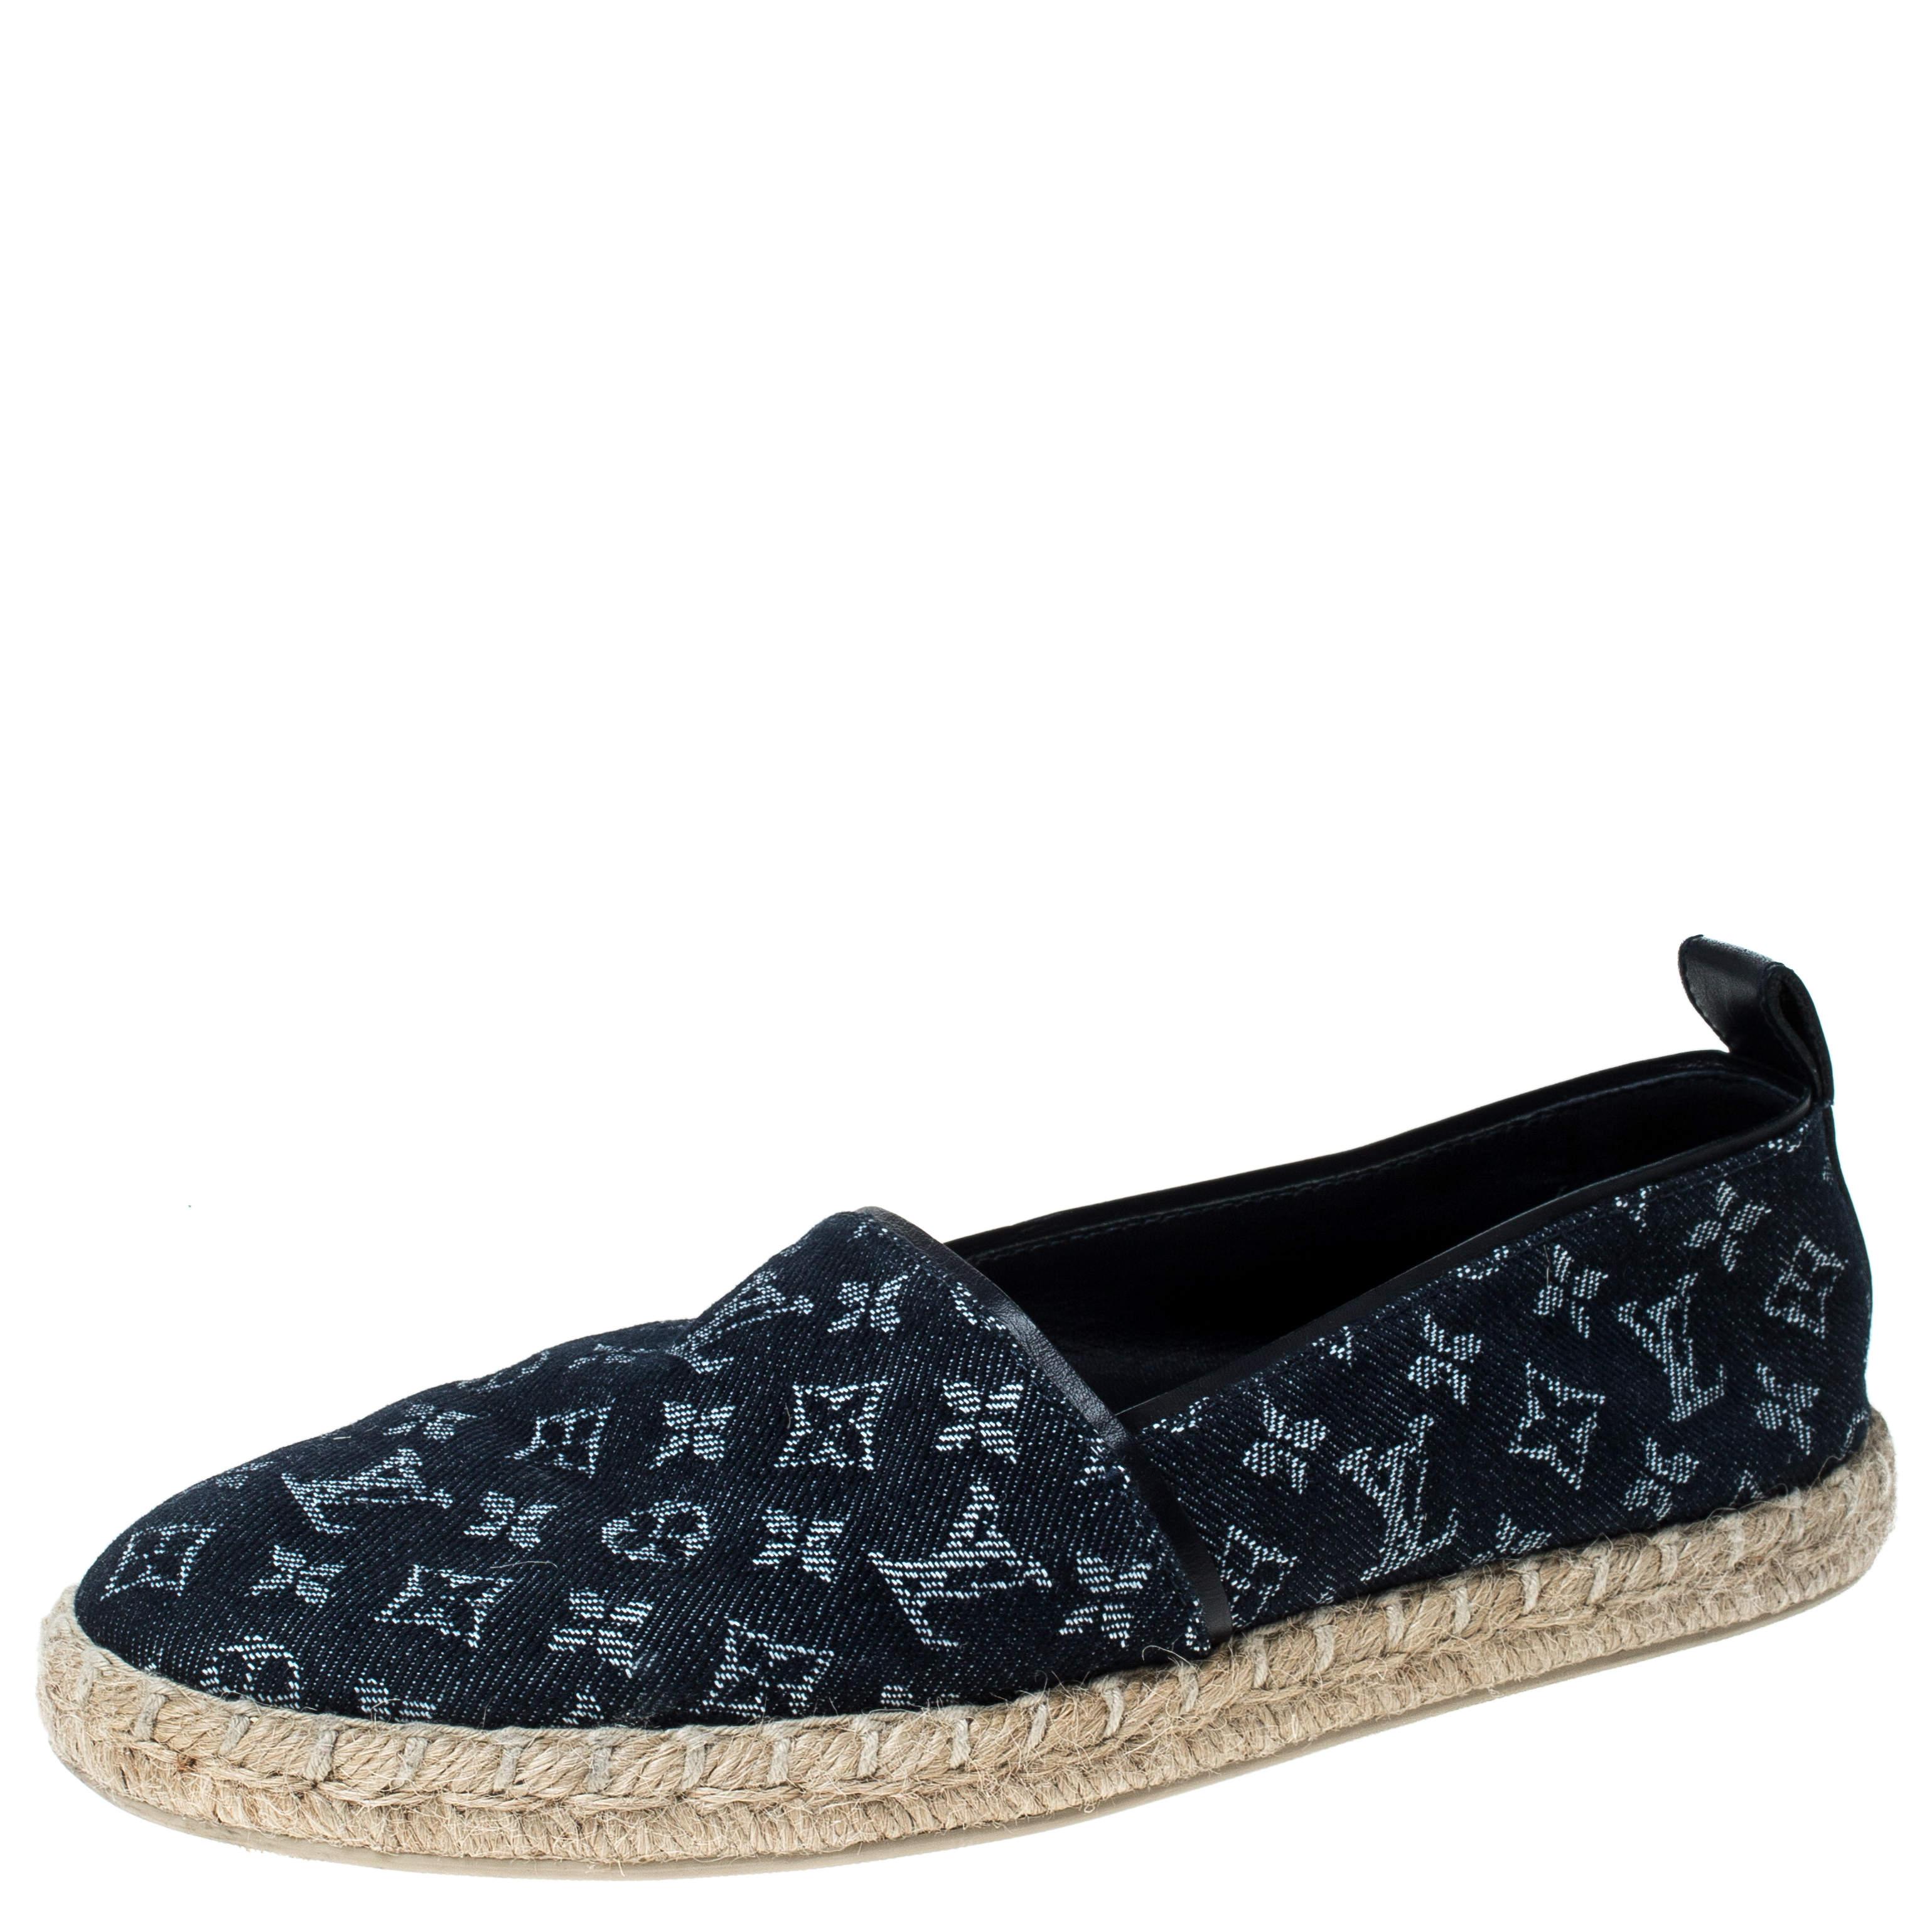 Louis Vuitton Monogram Denim Espadrille Loafers Size 38